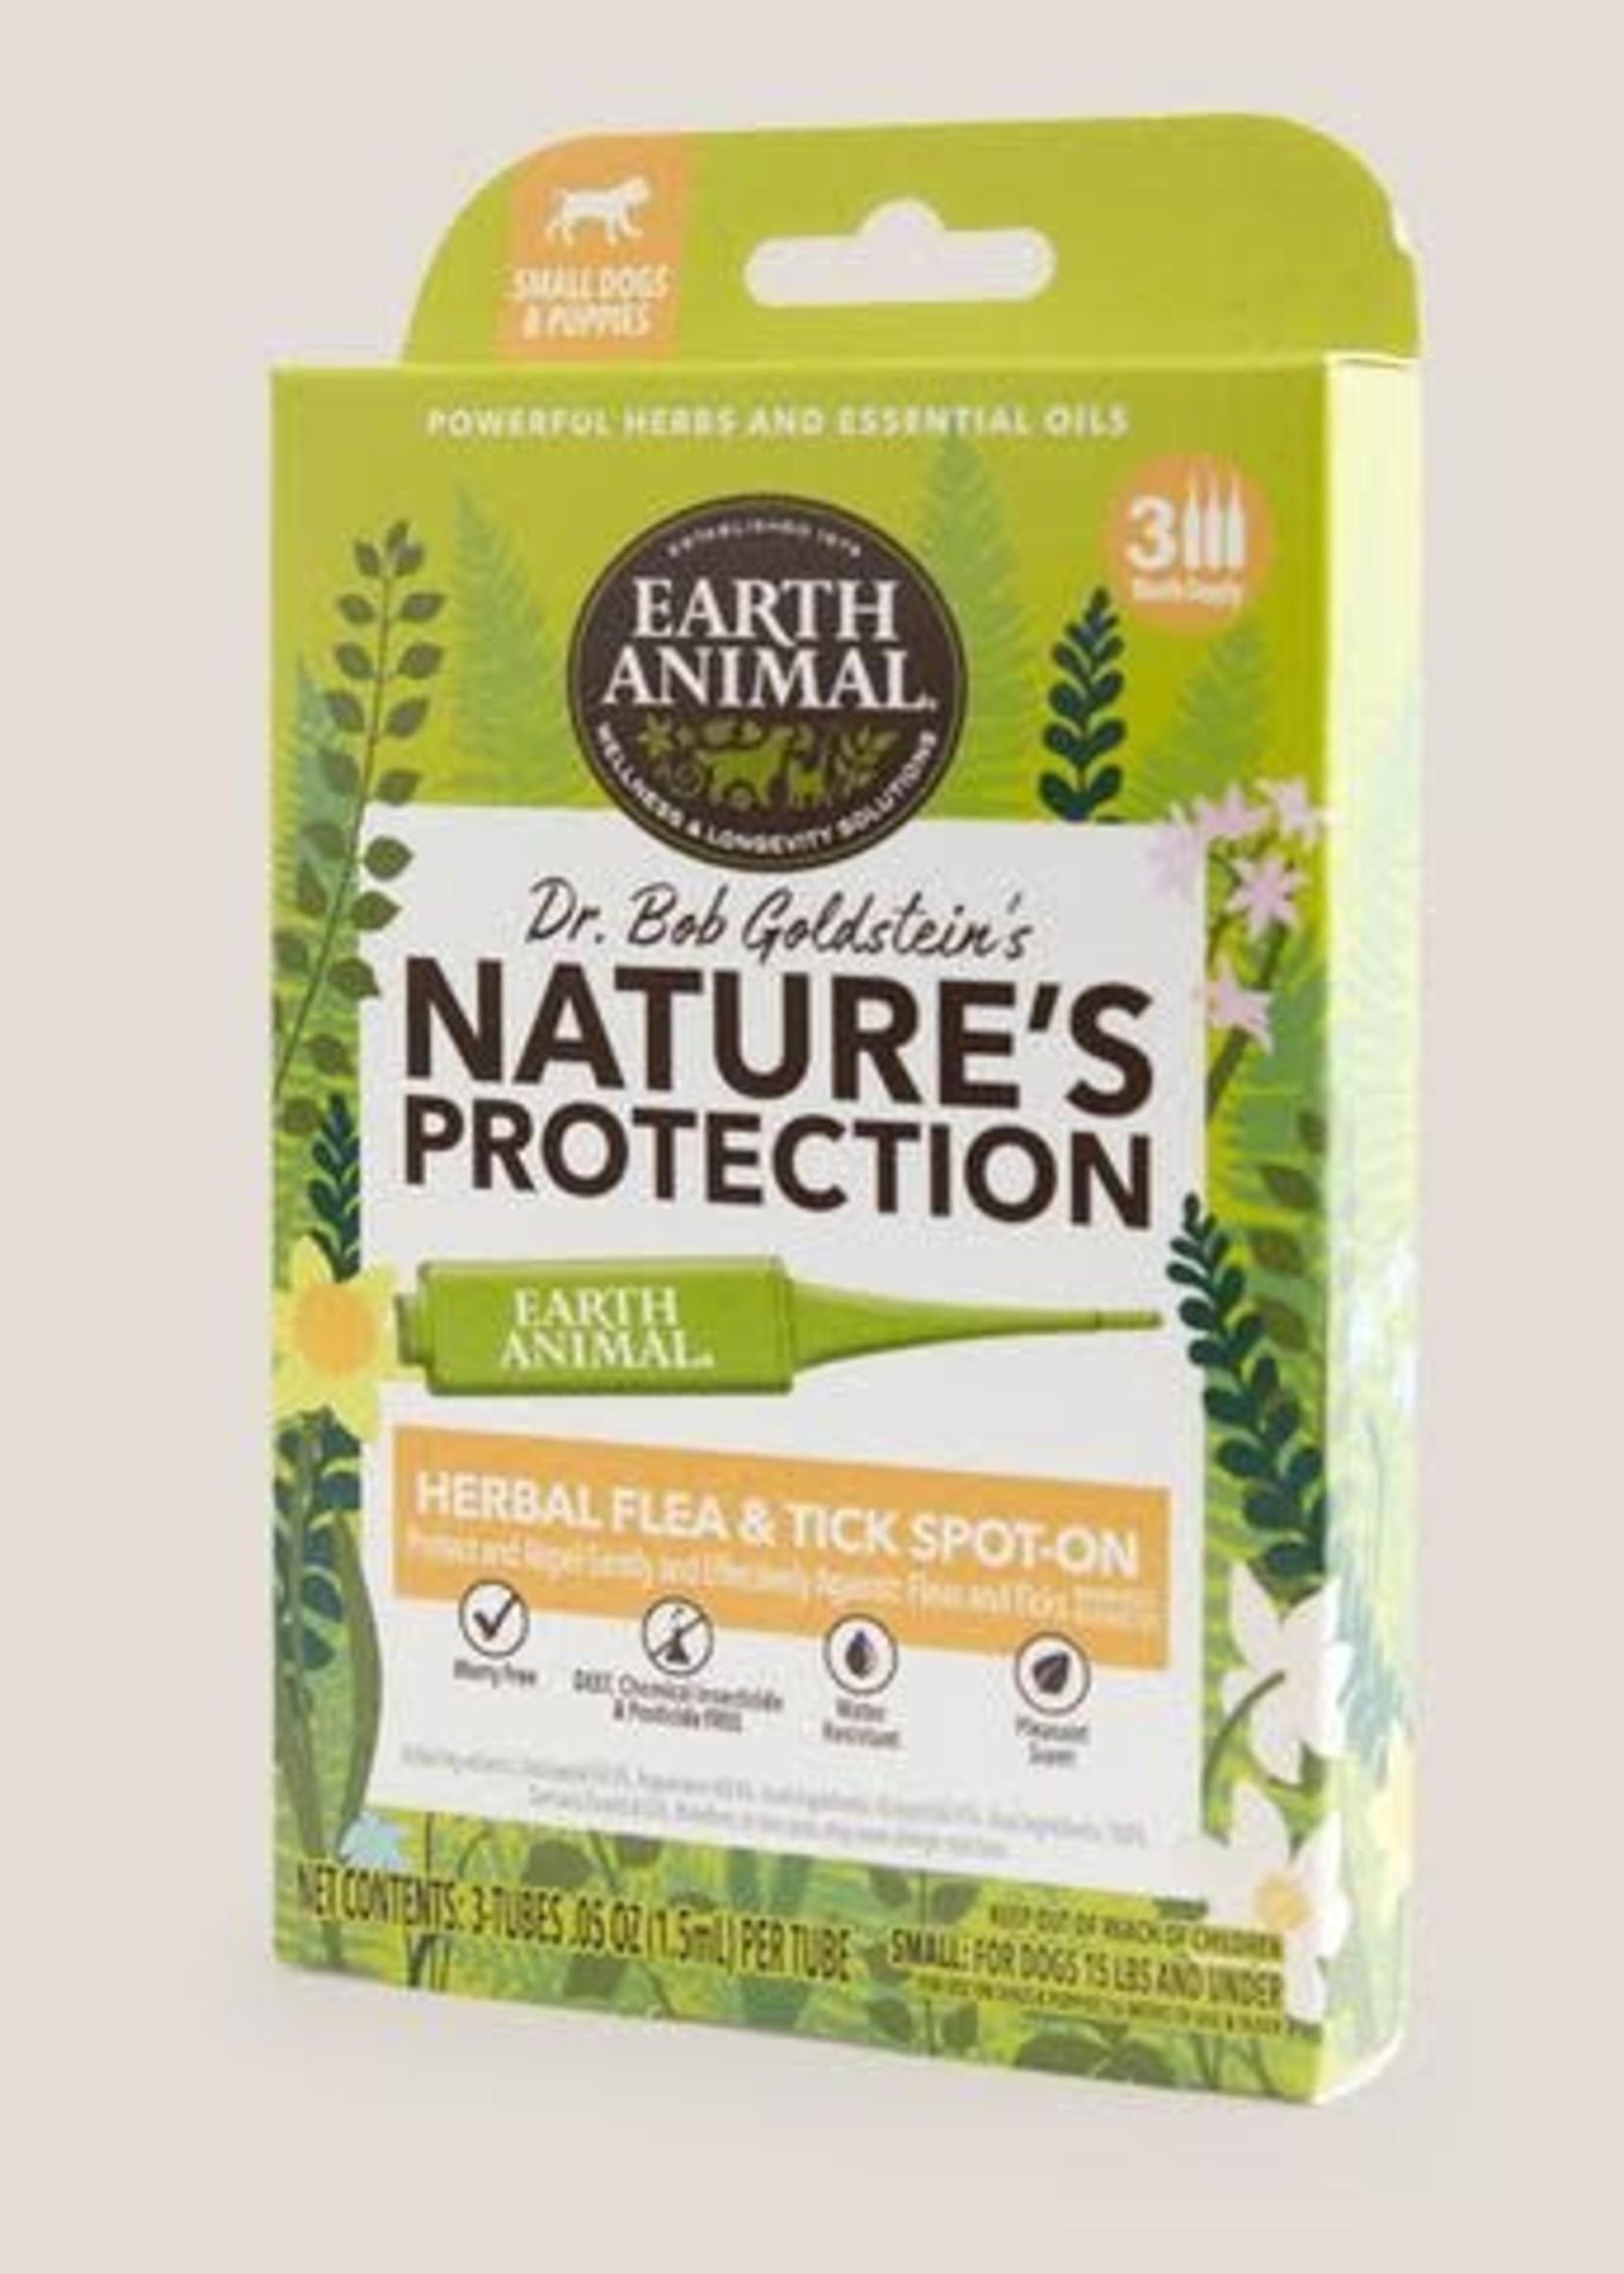 Earth Animal Earth Animal Dog Herbal Flea and Tick Spot-On